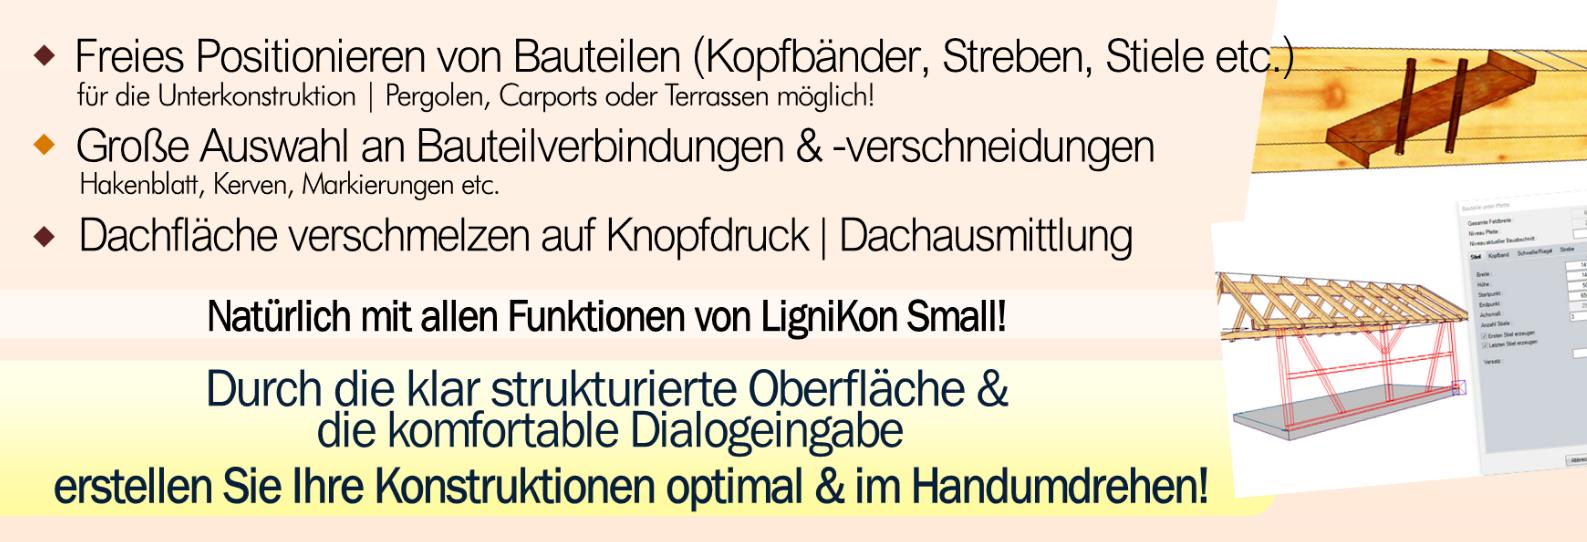 LIGNIKON Large V14 - zur Jahresmiete